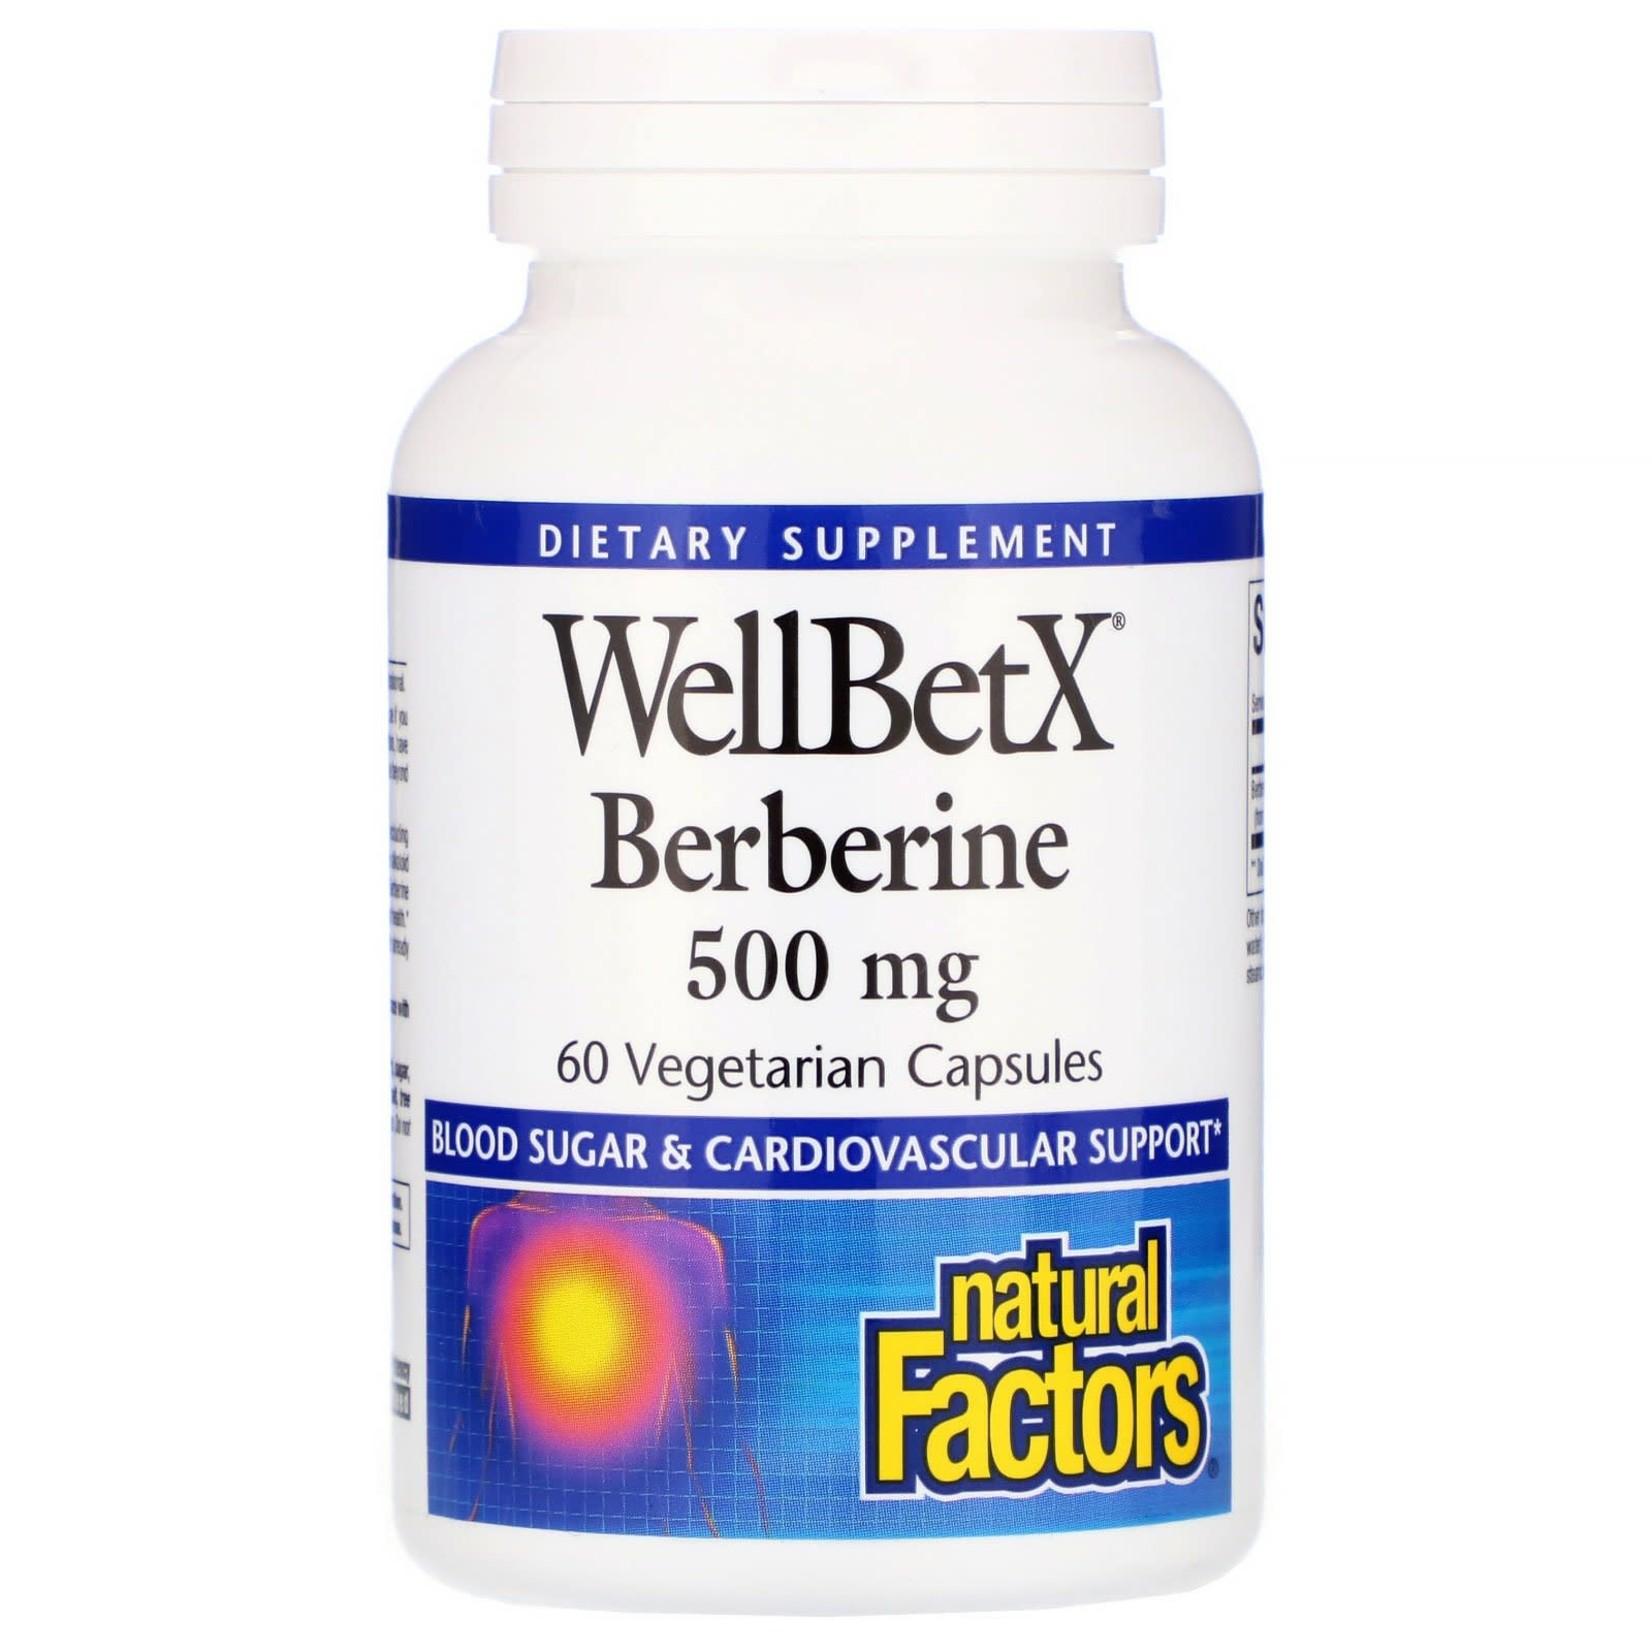 Natural Factors Natural Factors Berberine 500mg 60 caps